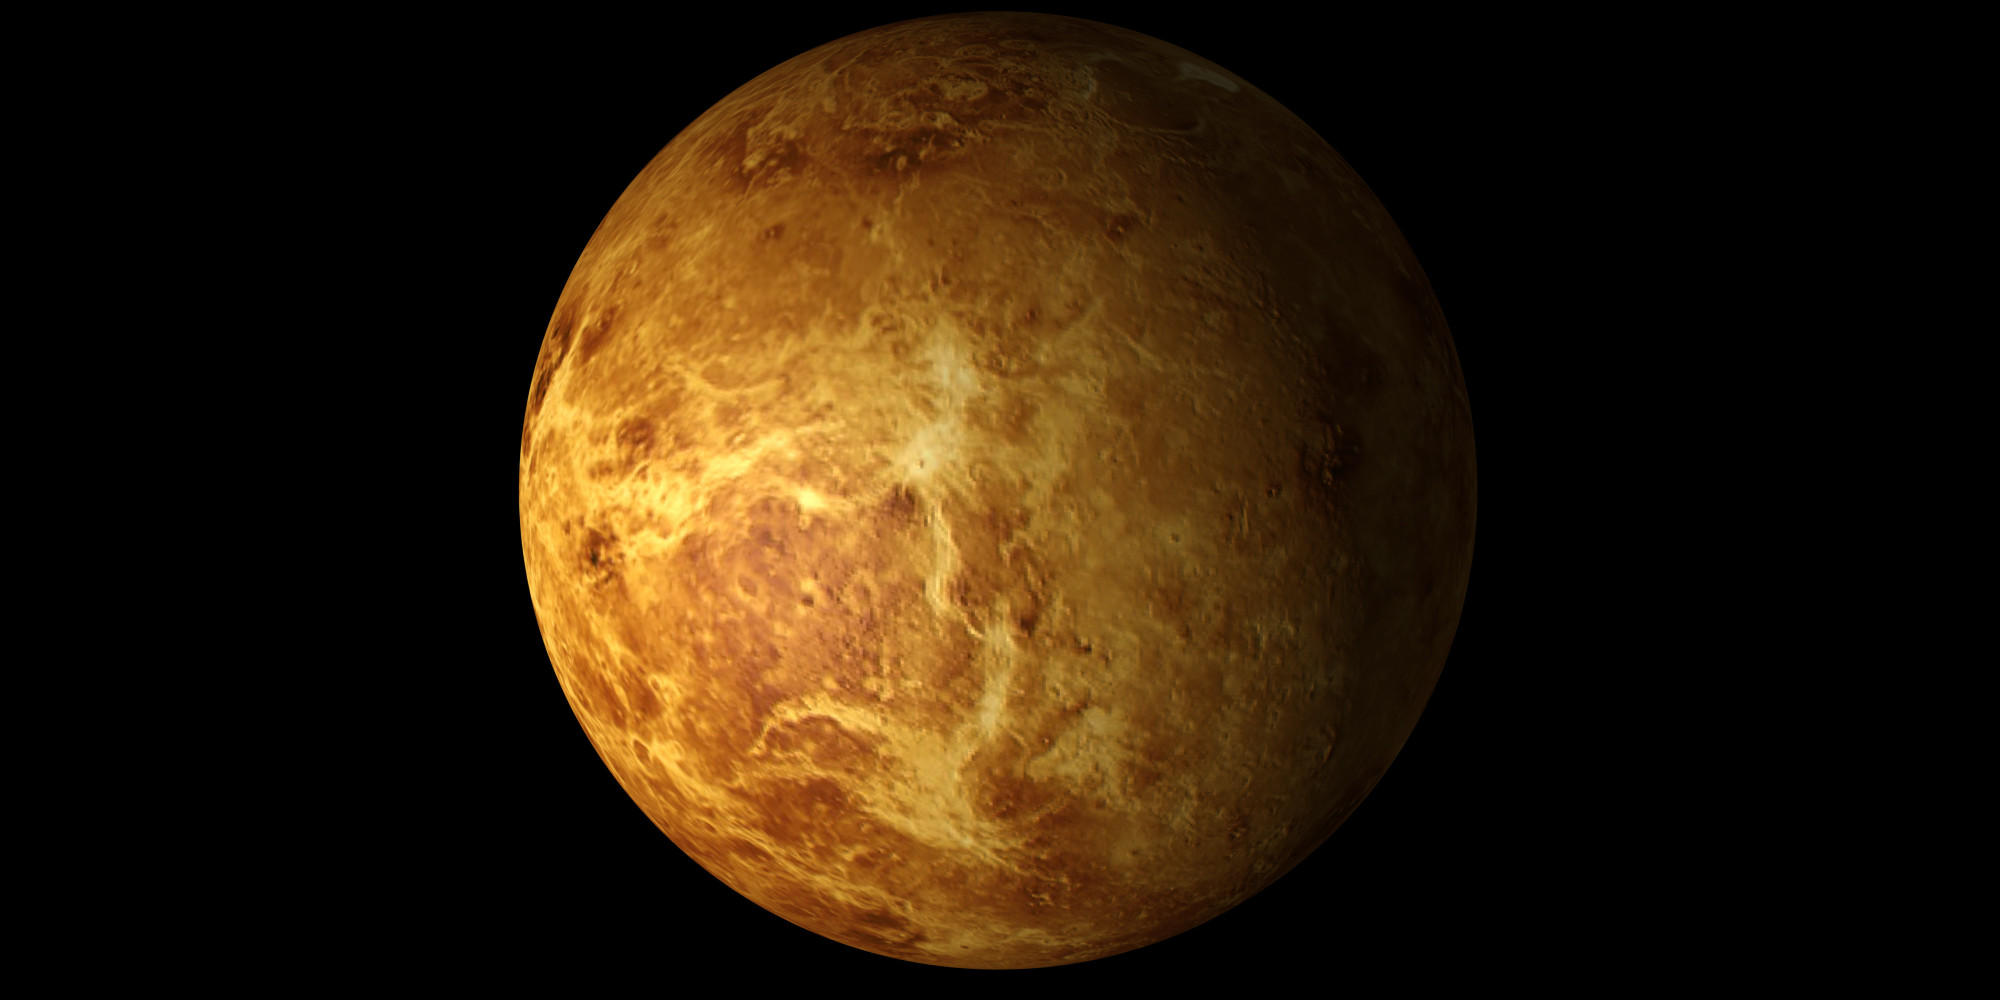 Scientists Are Thinking Of Ways To Terraform Venus